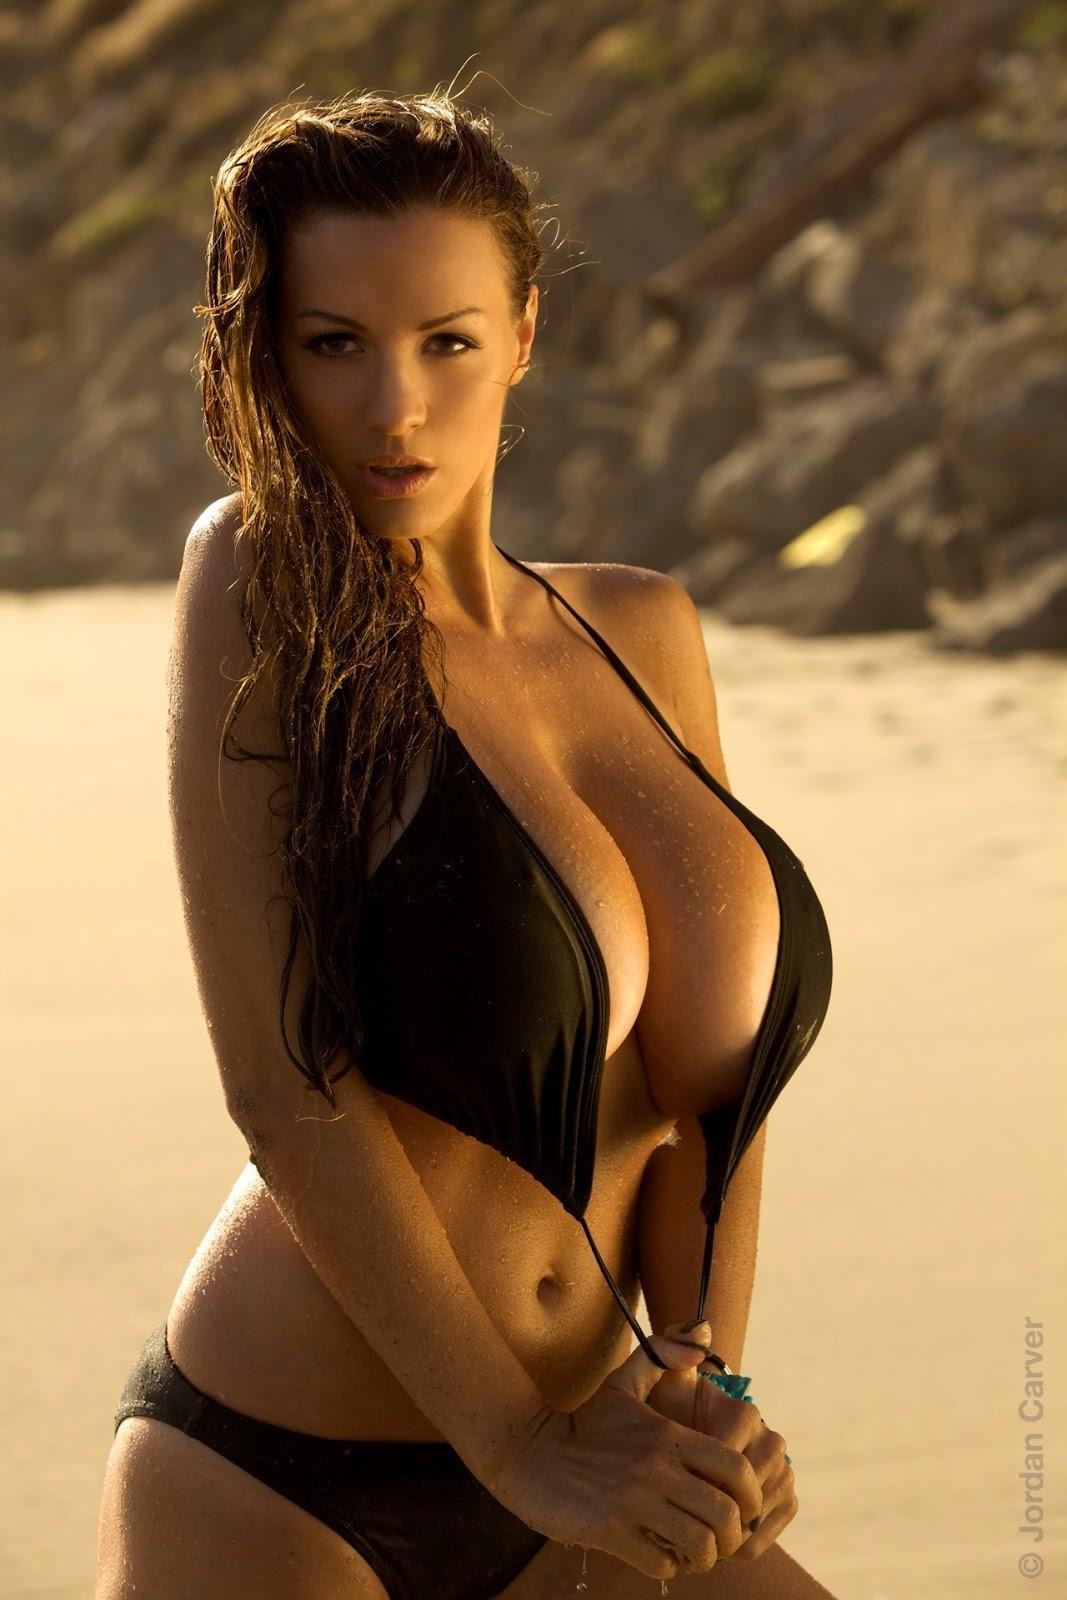 Jordan Carver Surf & Turf Hot Photoshoot HD Images | Damn Sexy